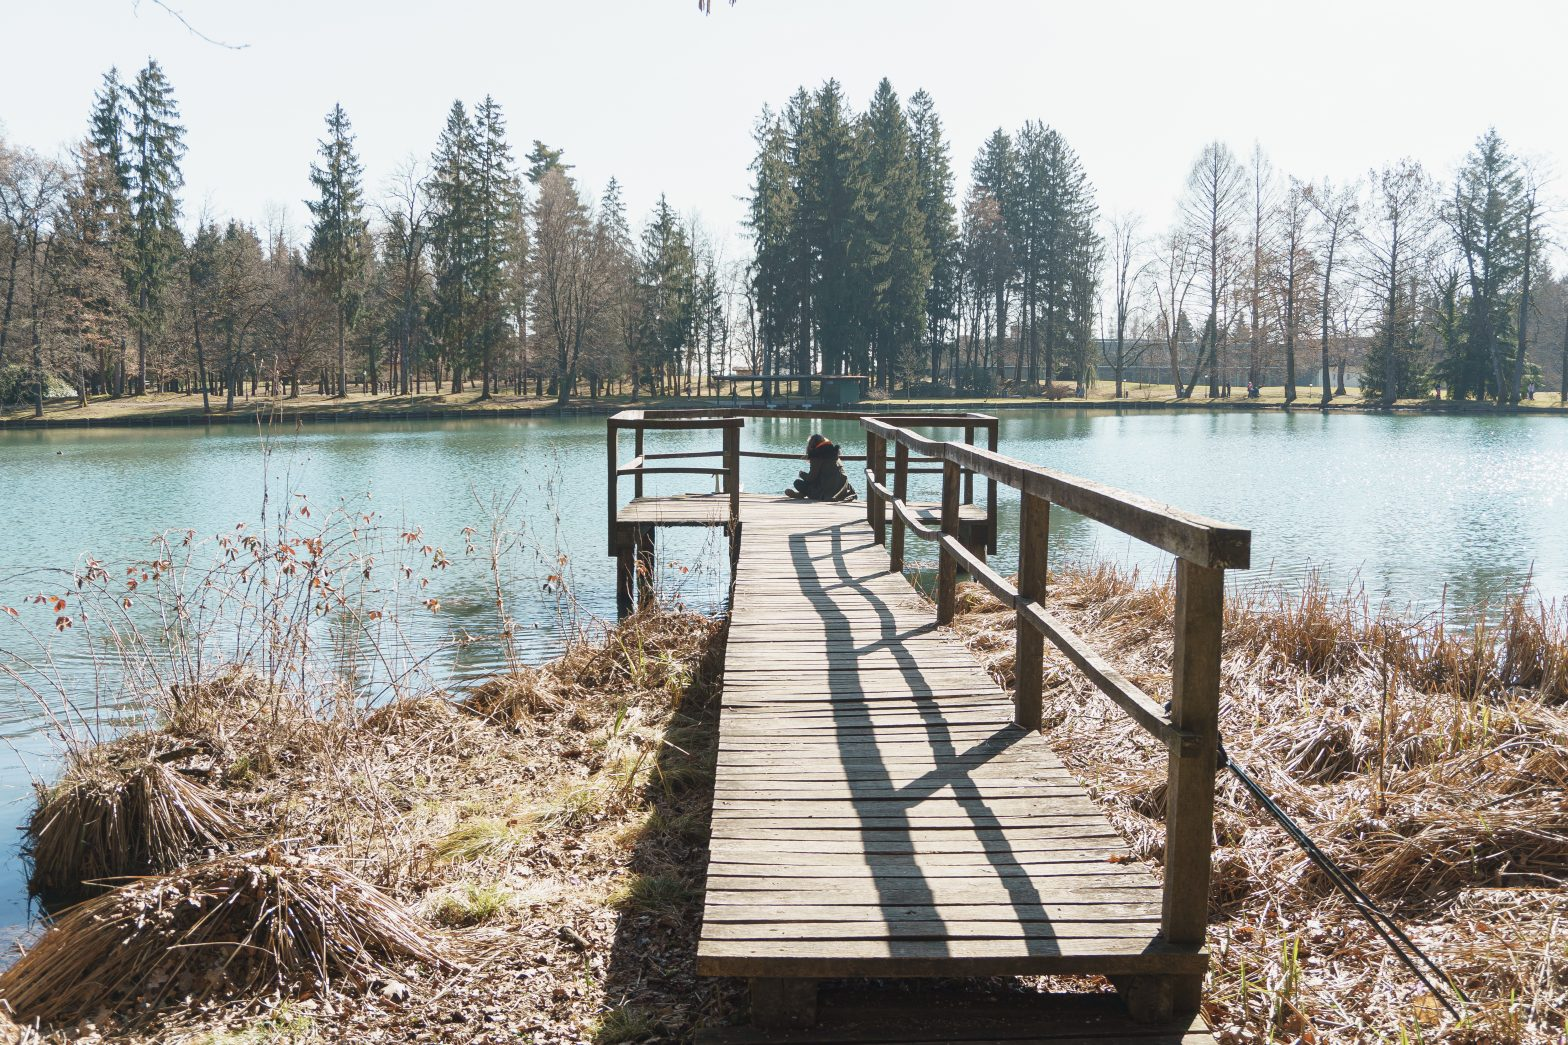 Brdo pri Kranju, photo by: Dusan Smolnikar